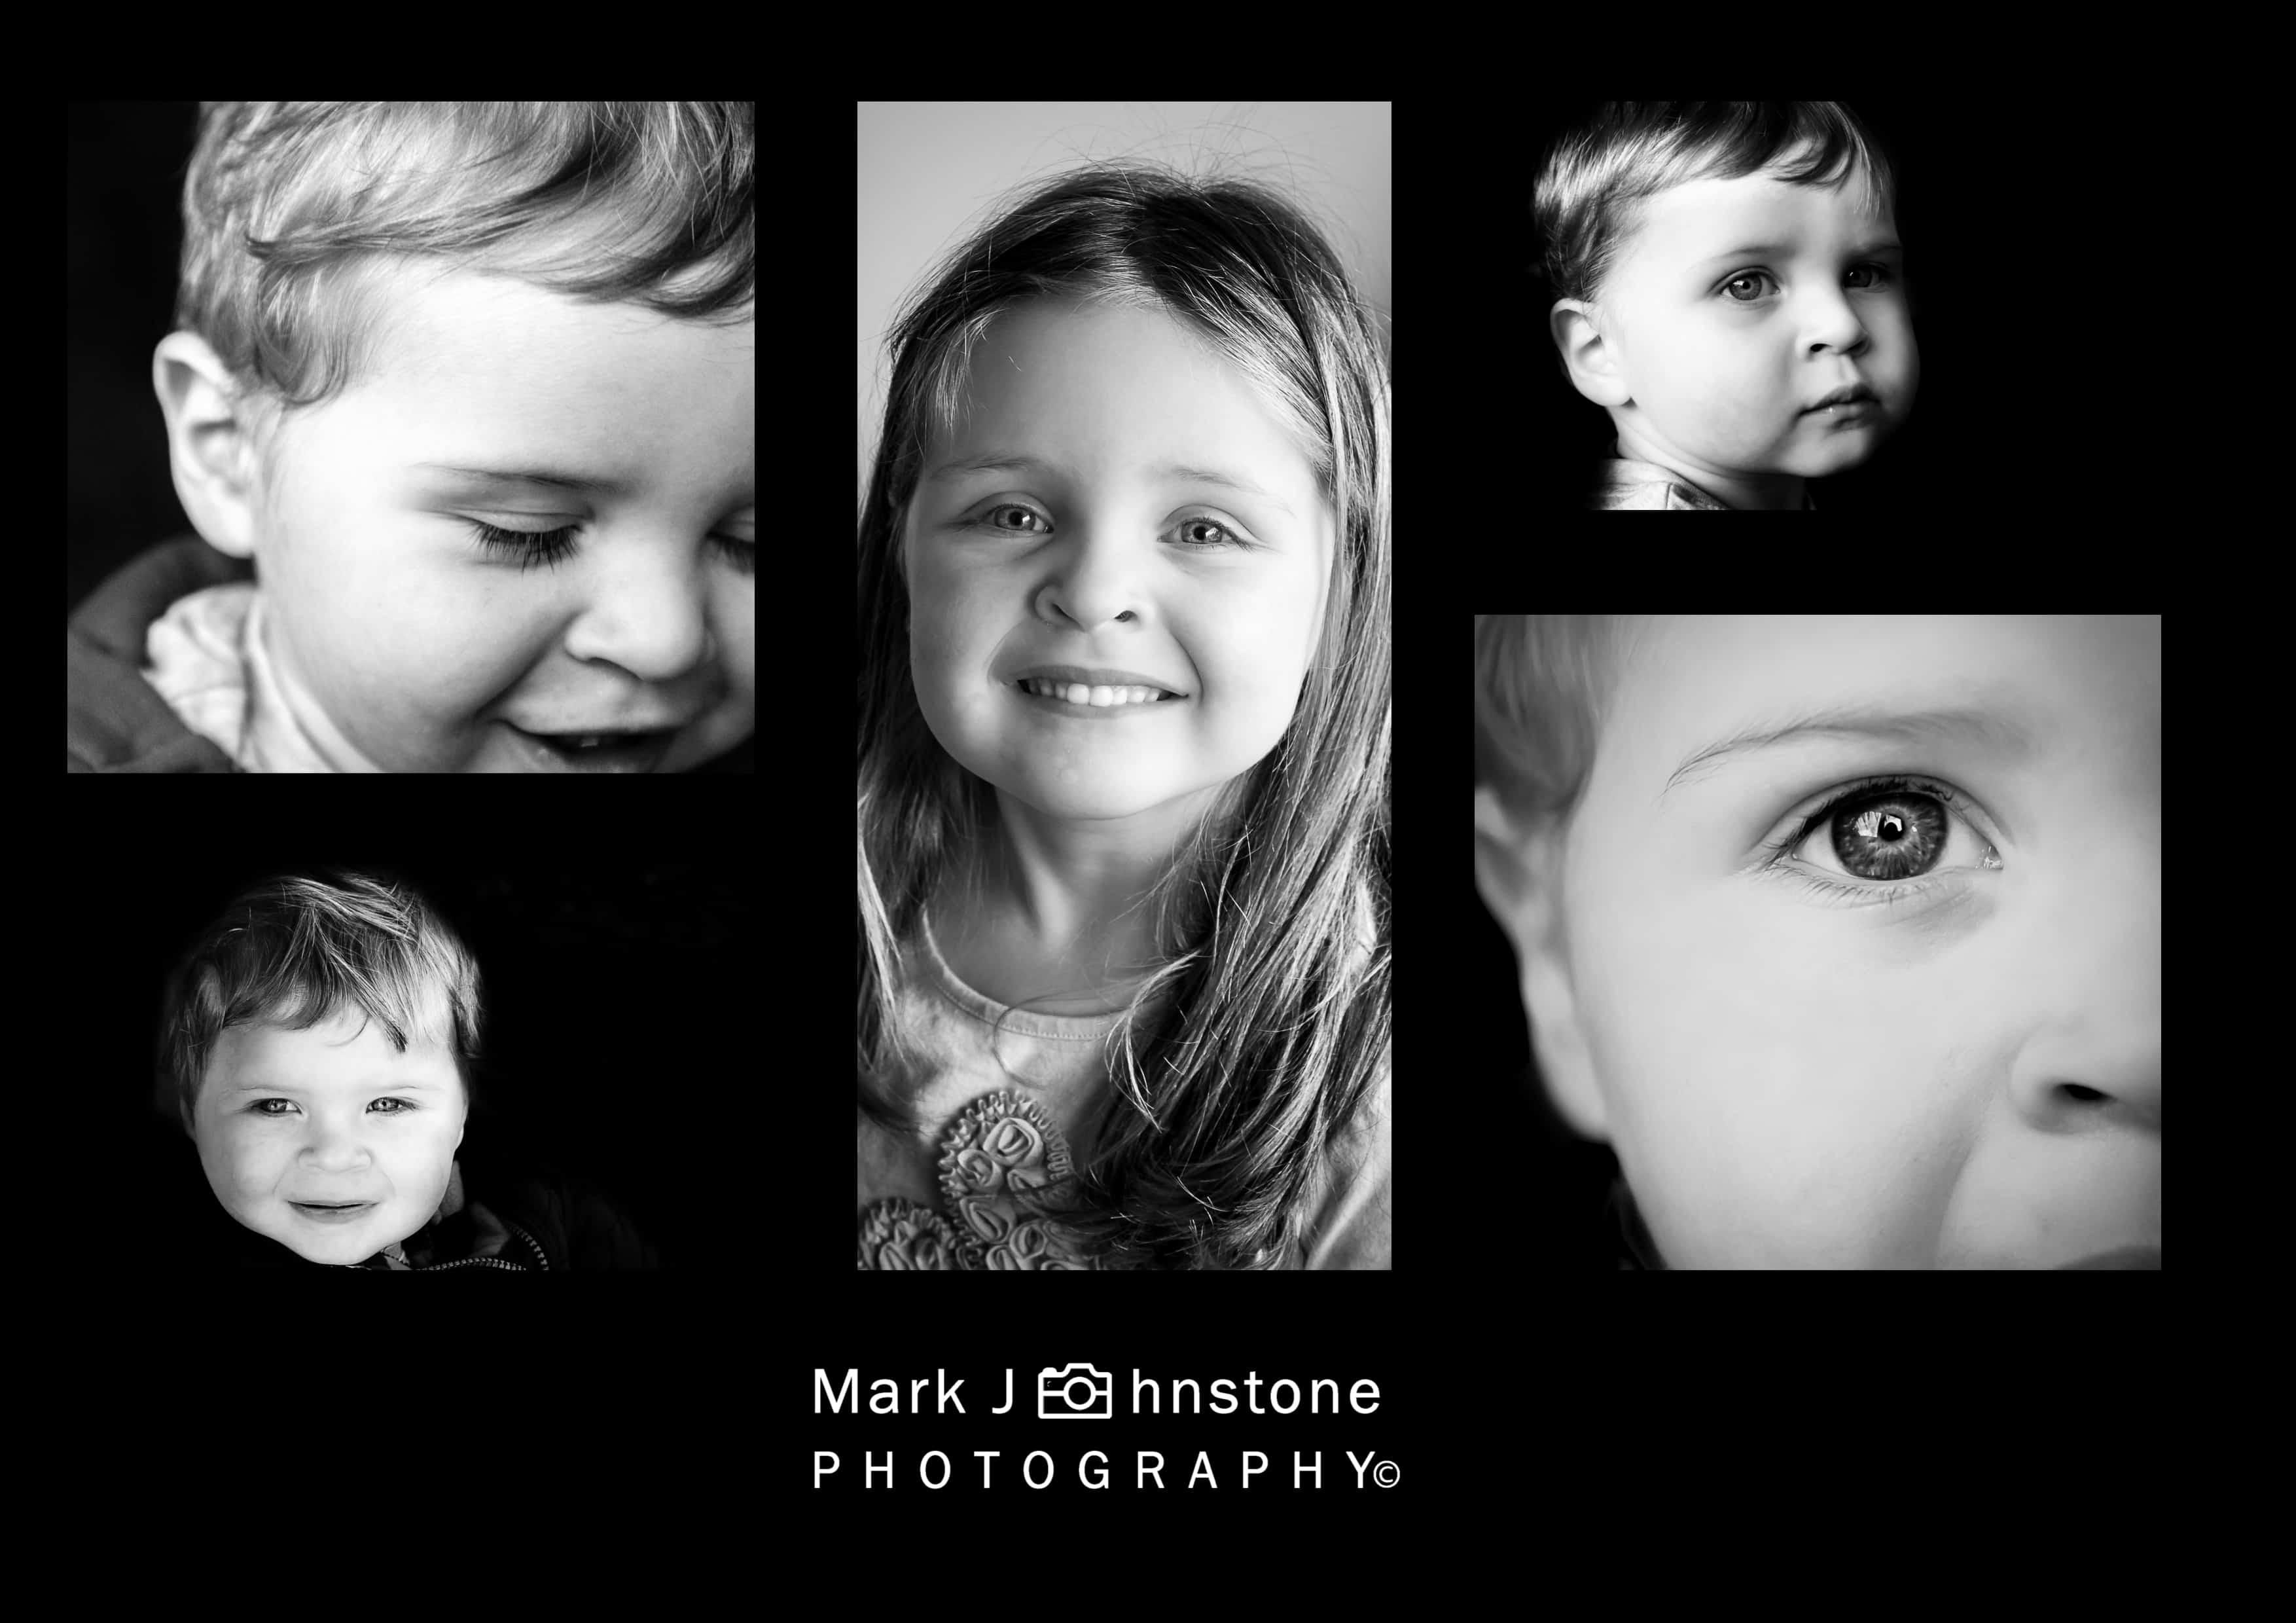 Portraits 1 Mark Johnstone Photography & Design